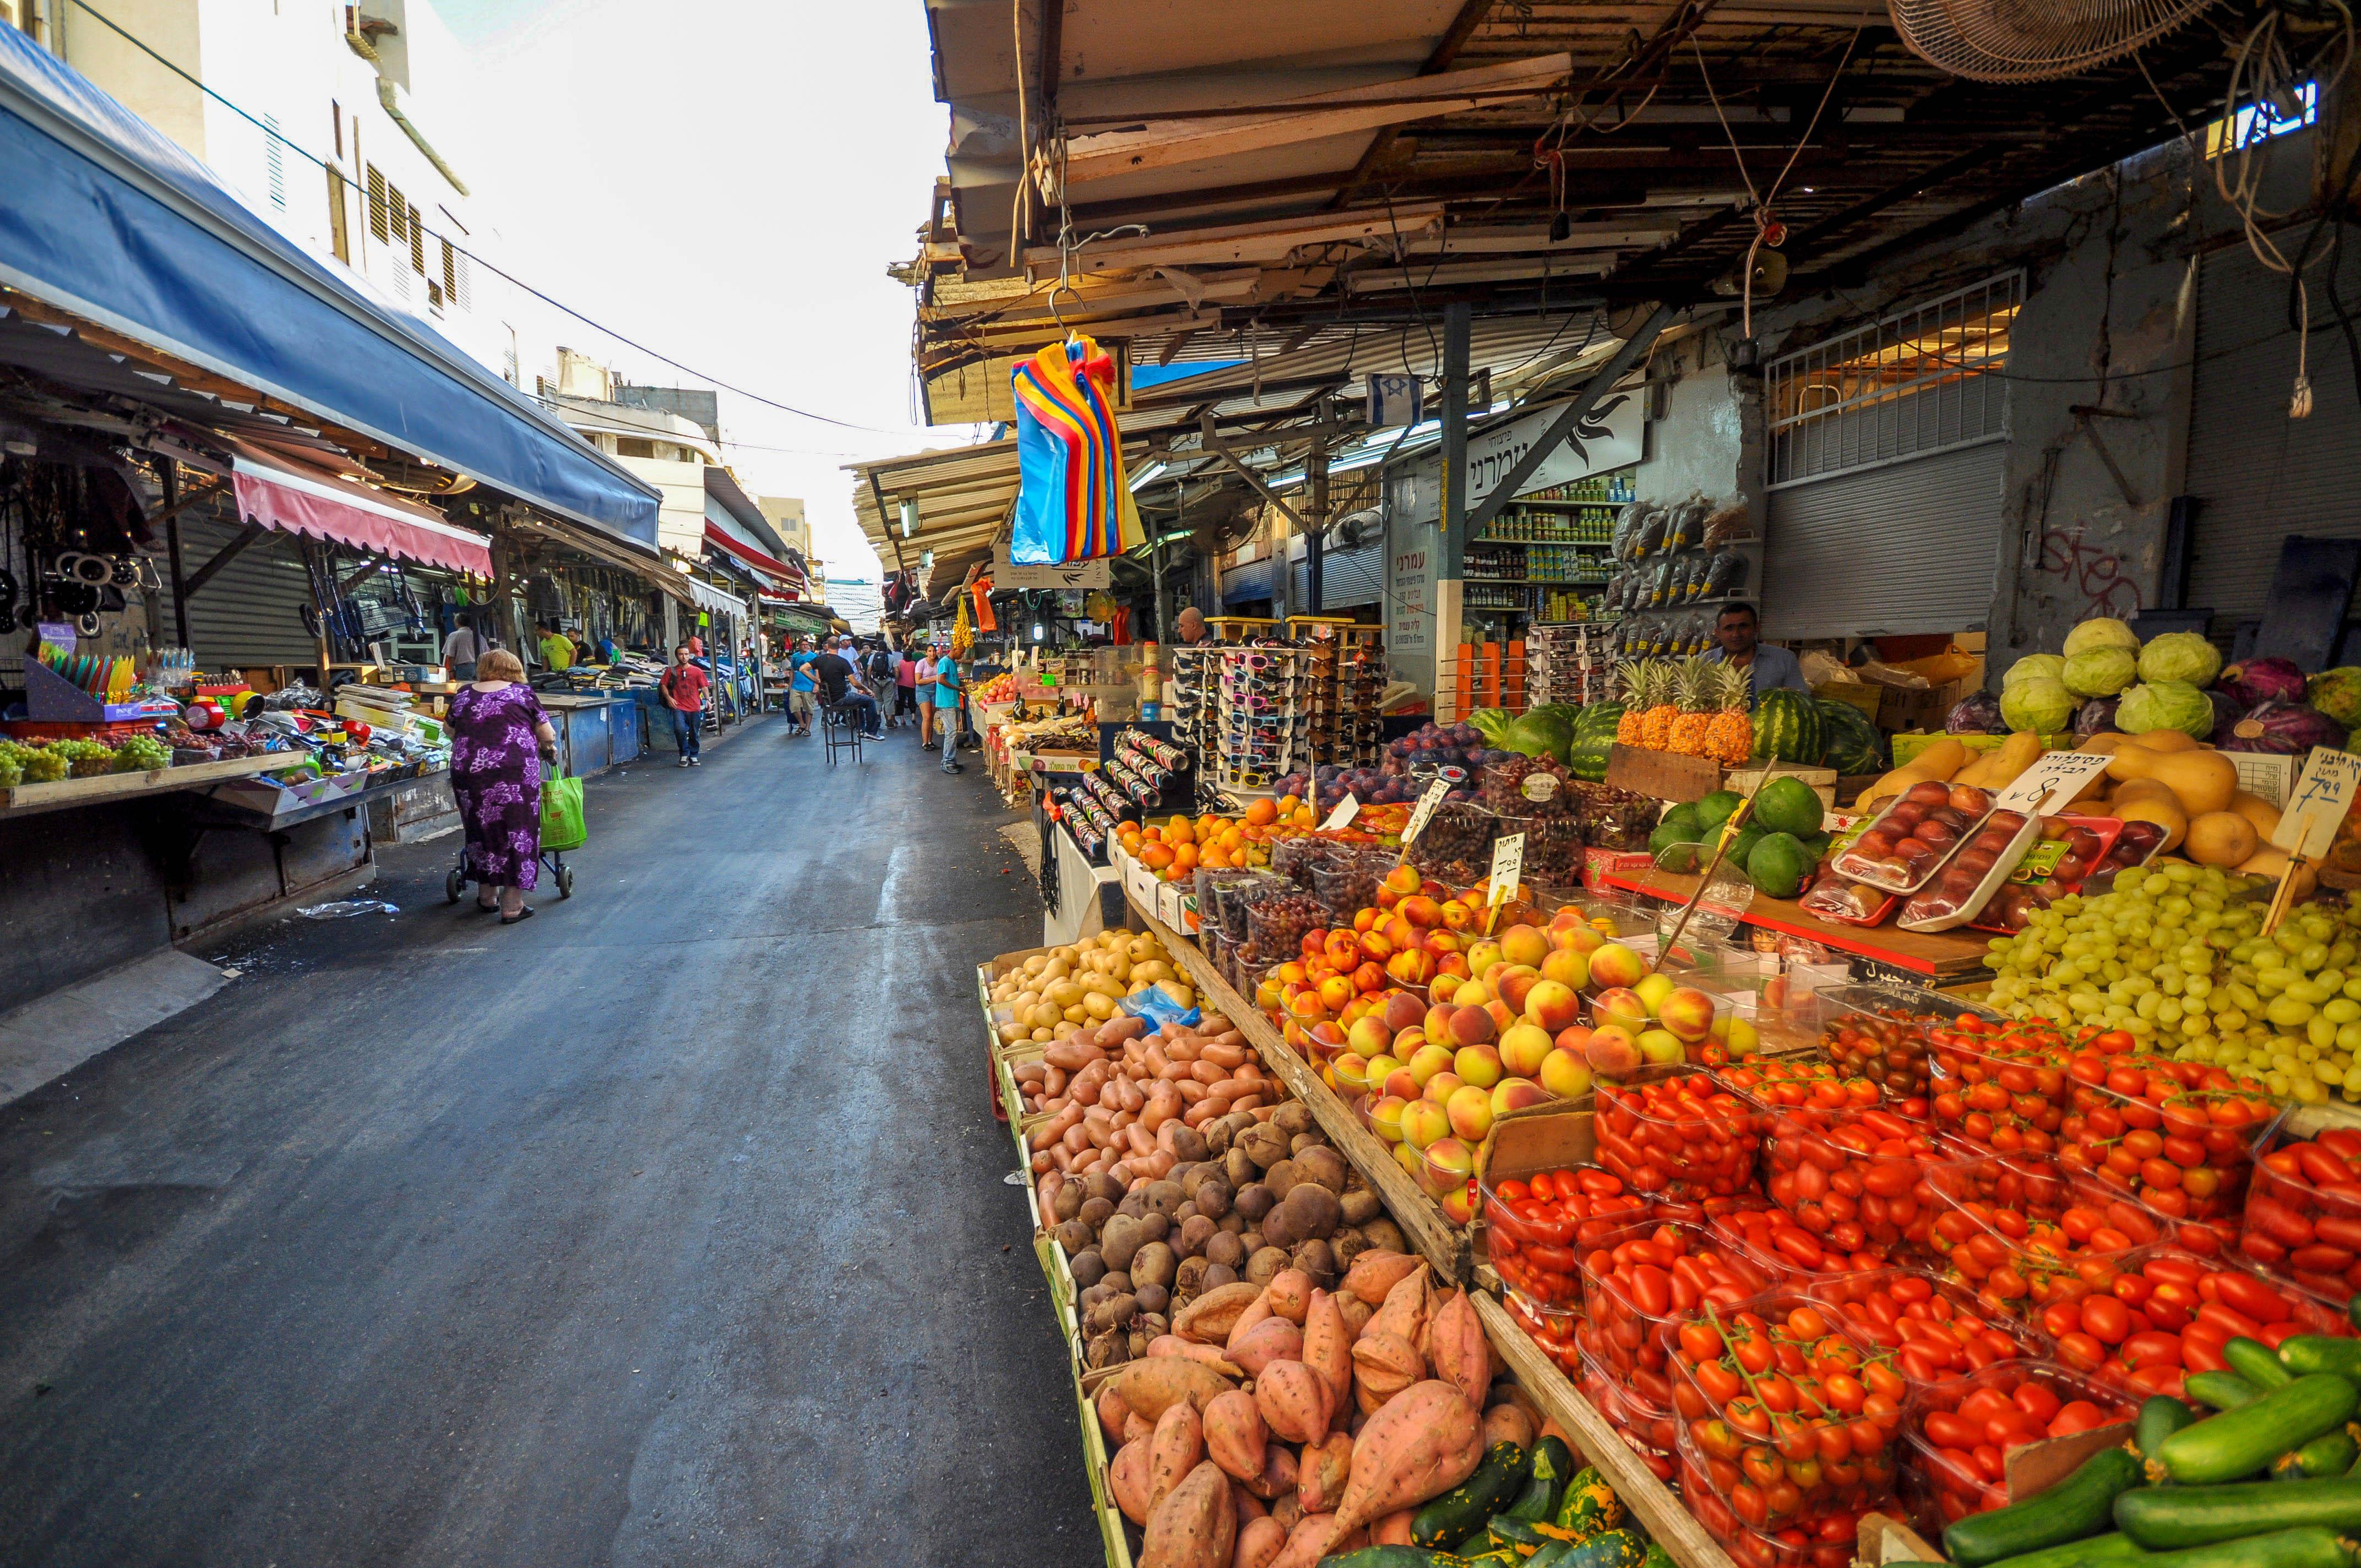 Carmel Market © Sanjay Shukla